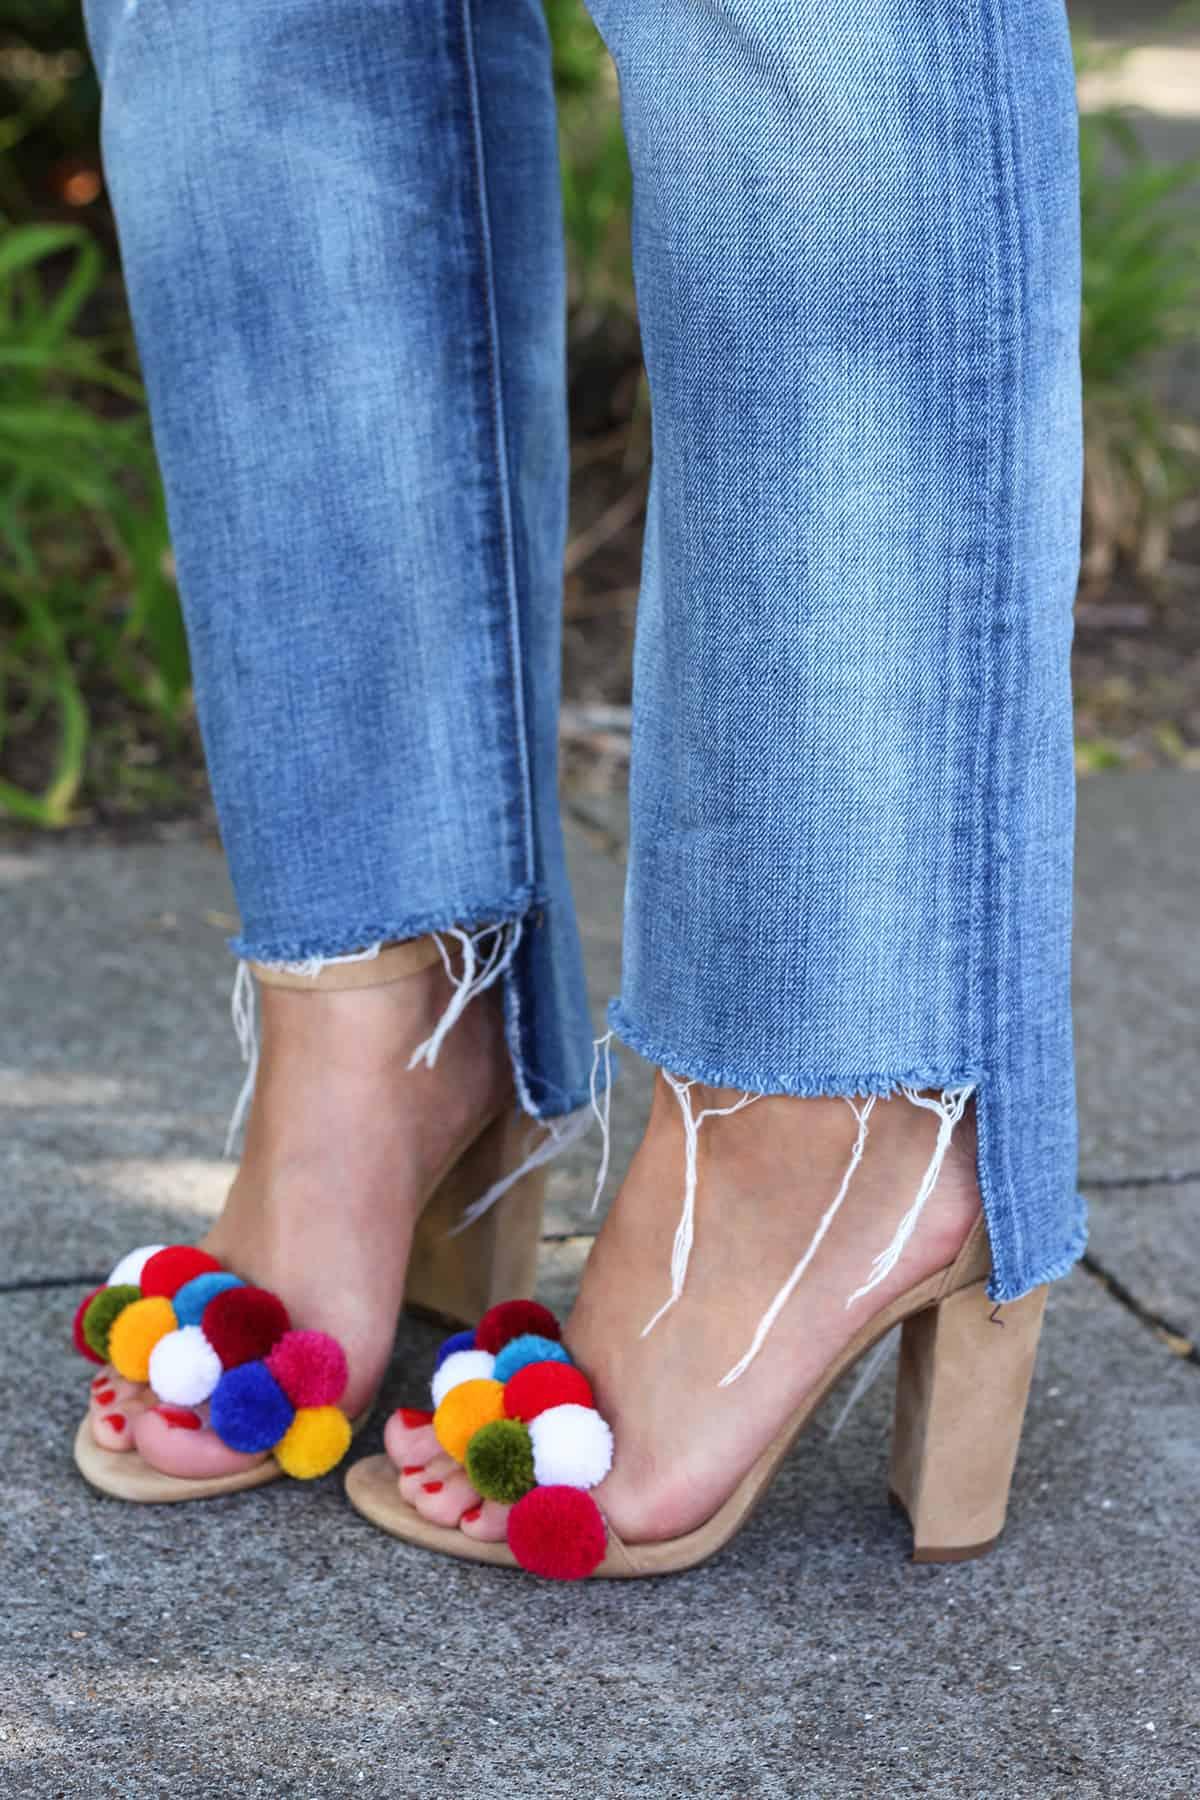 Colourful pom pom heeled sandals